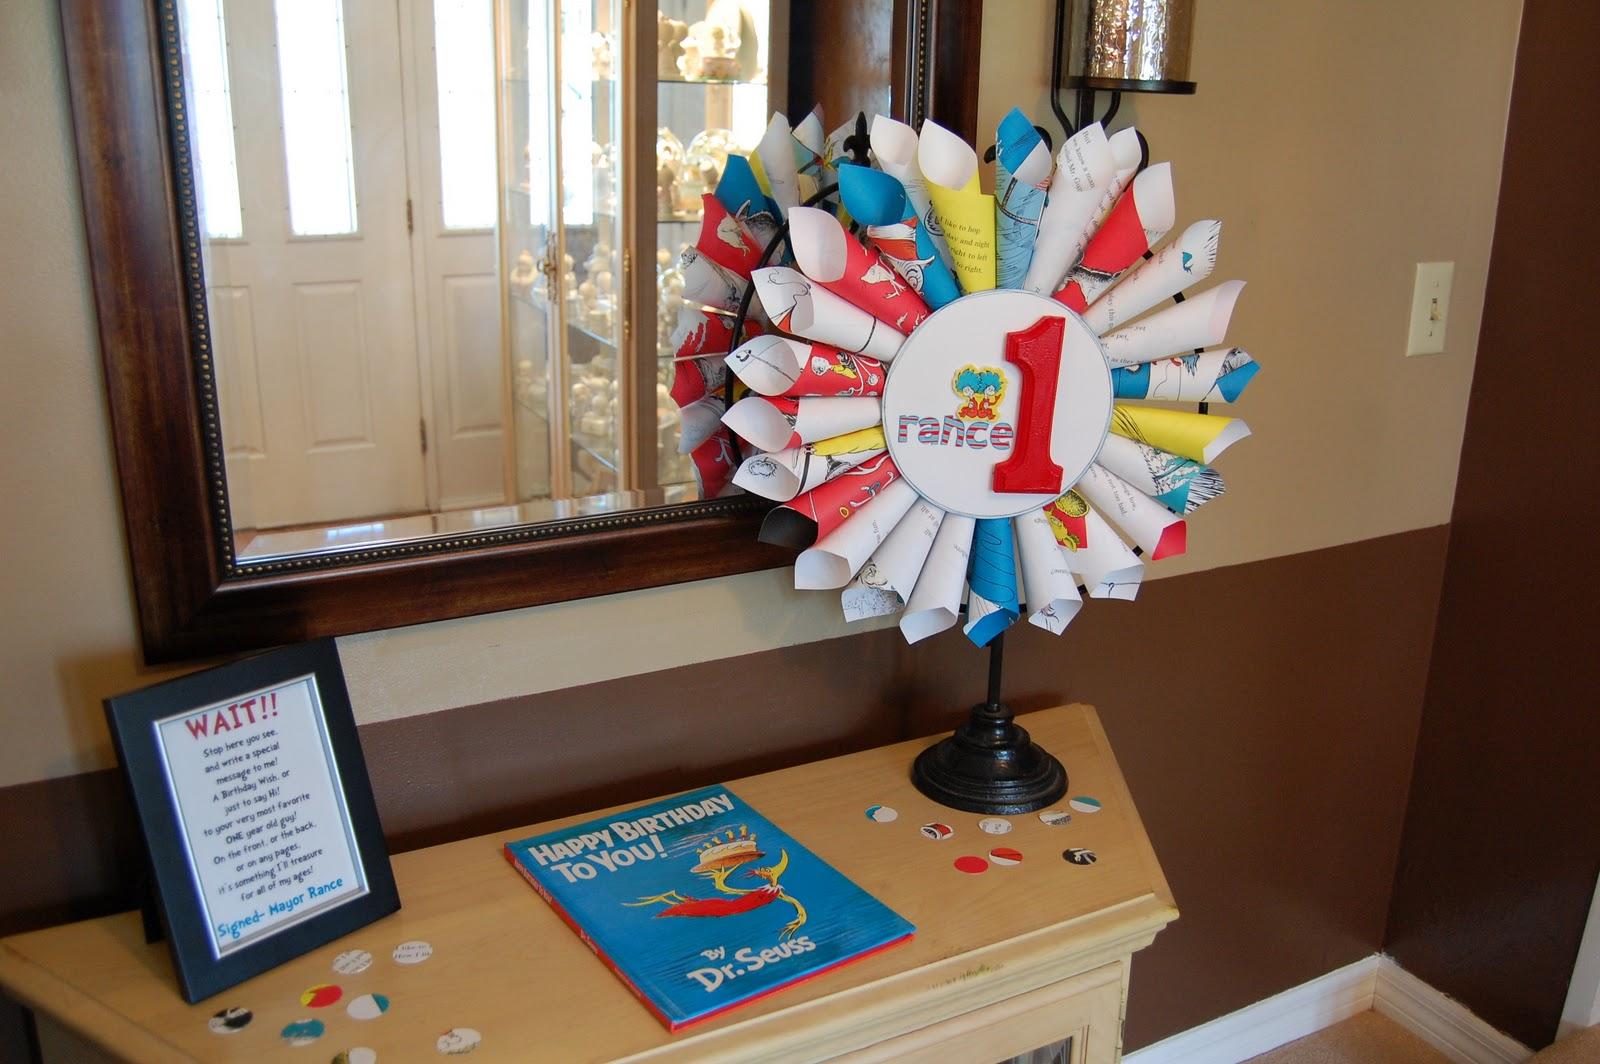 kristy.makes: dr. seuss birthday: decorations